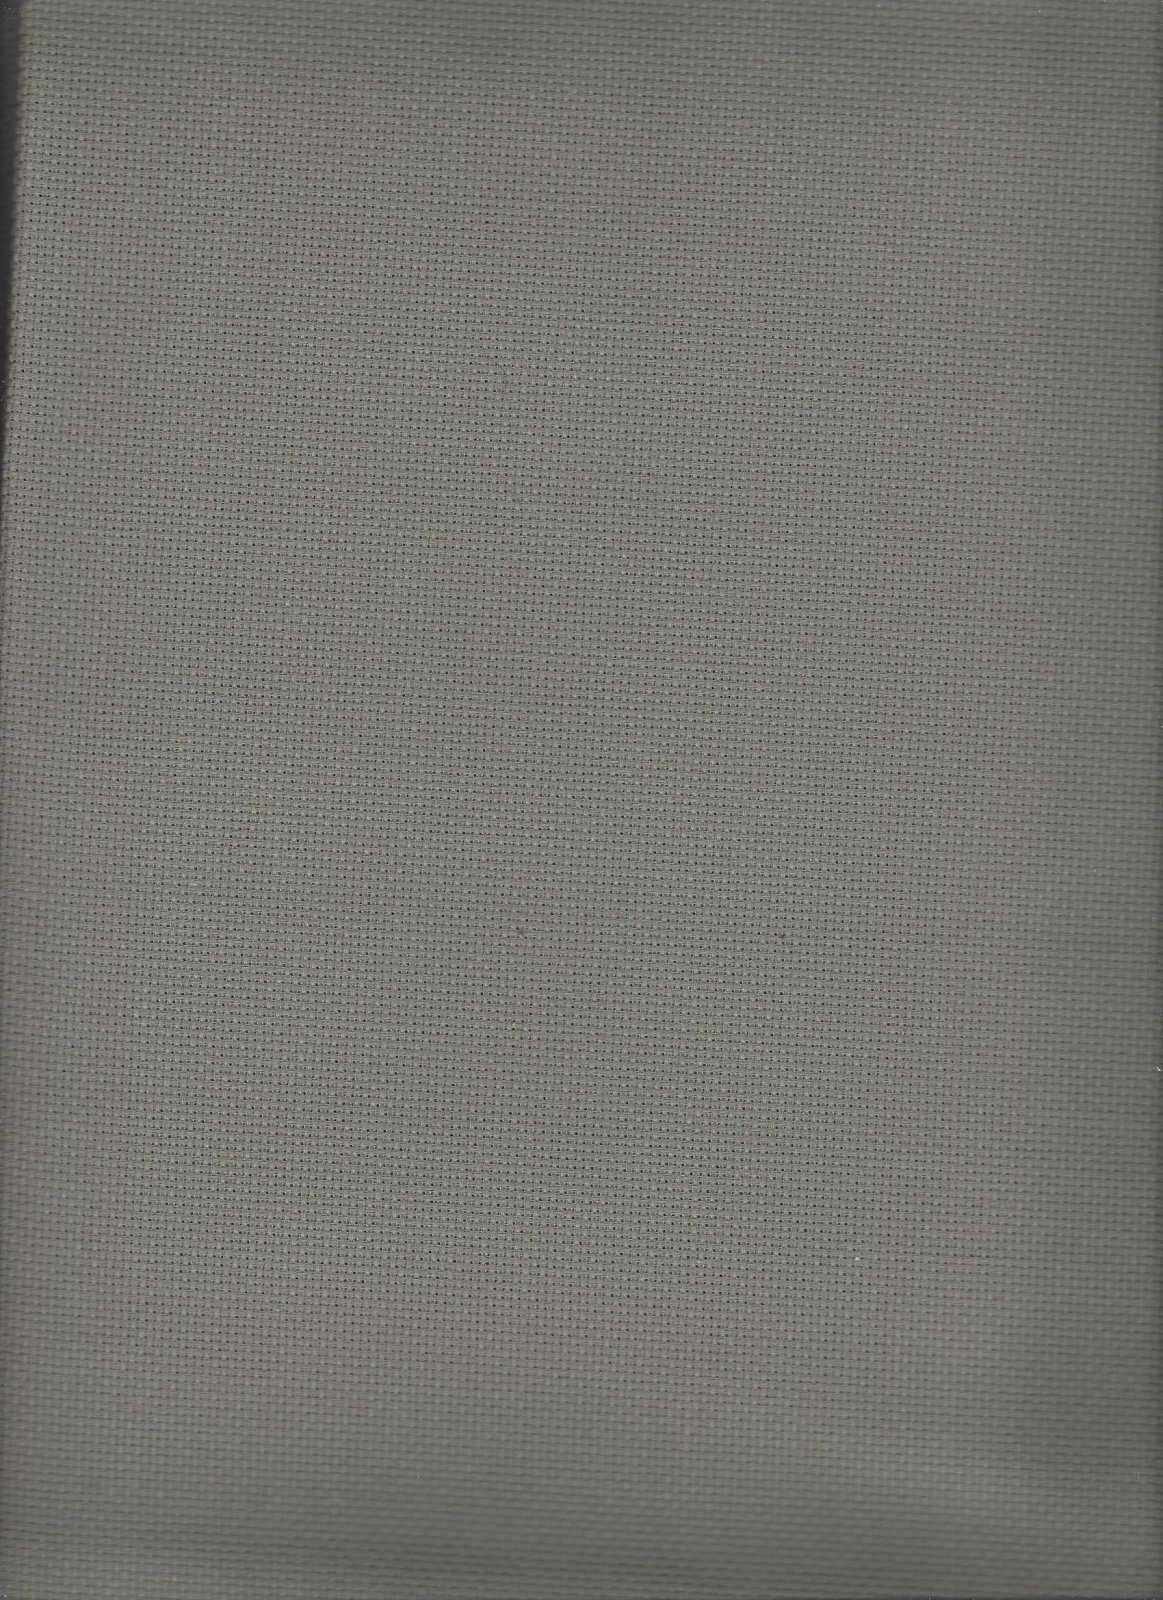 Aida 16ct Barnwood/Cobblestone (discontinued color)